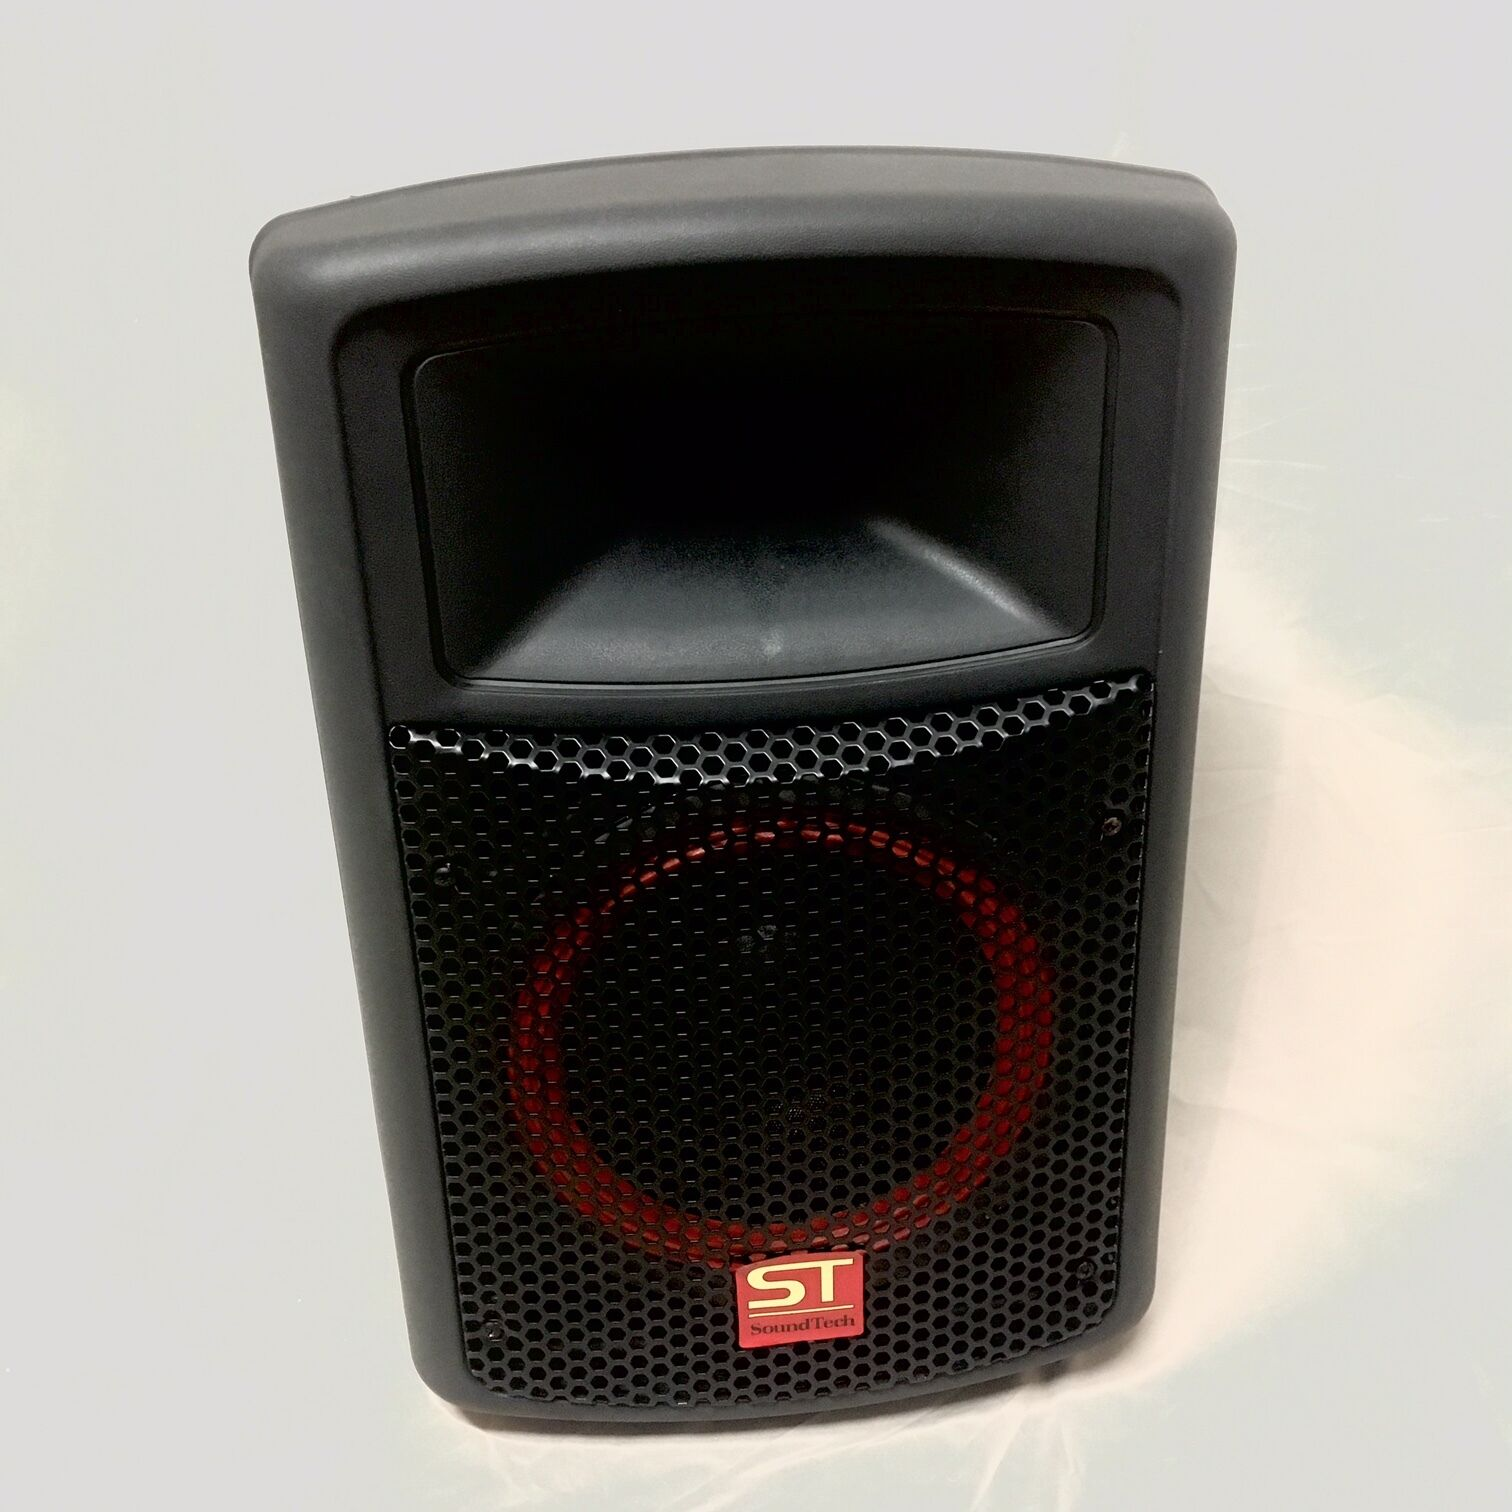 Soundtech ST10RX 2-forma pasiva 8 Ohms Parlantes PA 10 10 10  300W 150W RMS de programa  promociones de equipo